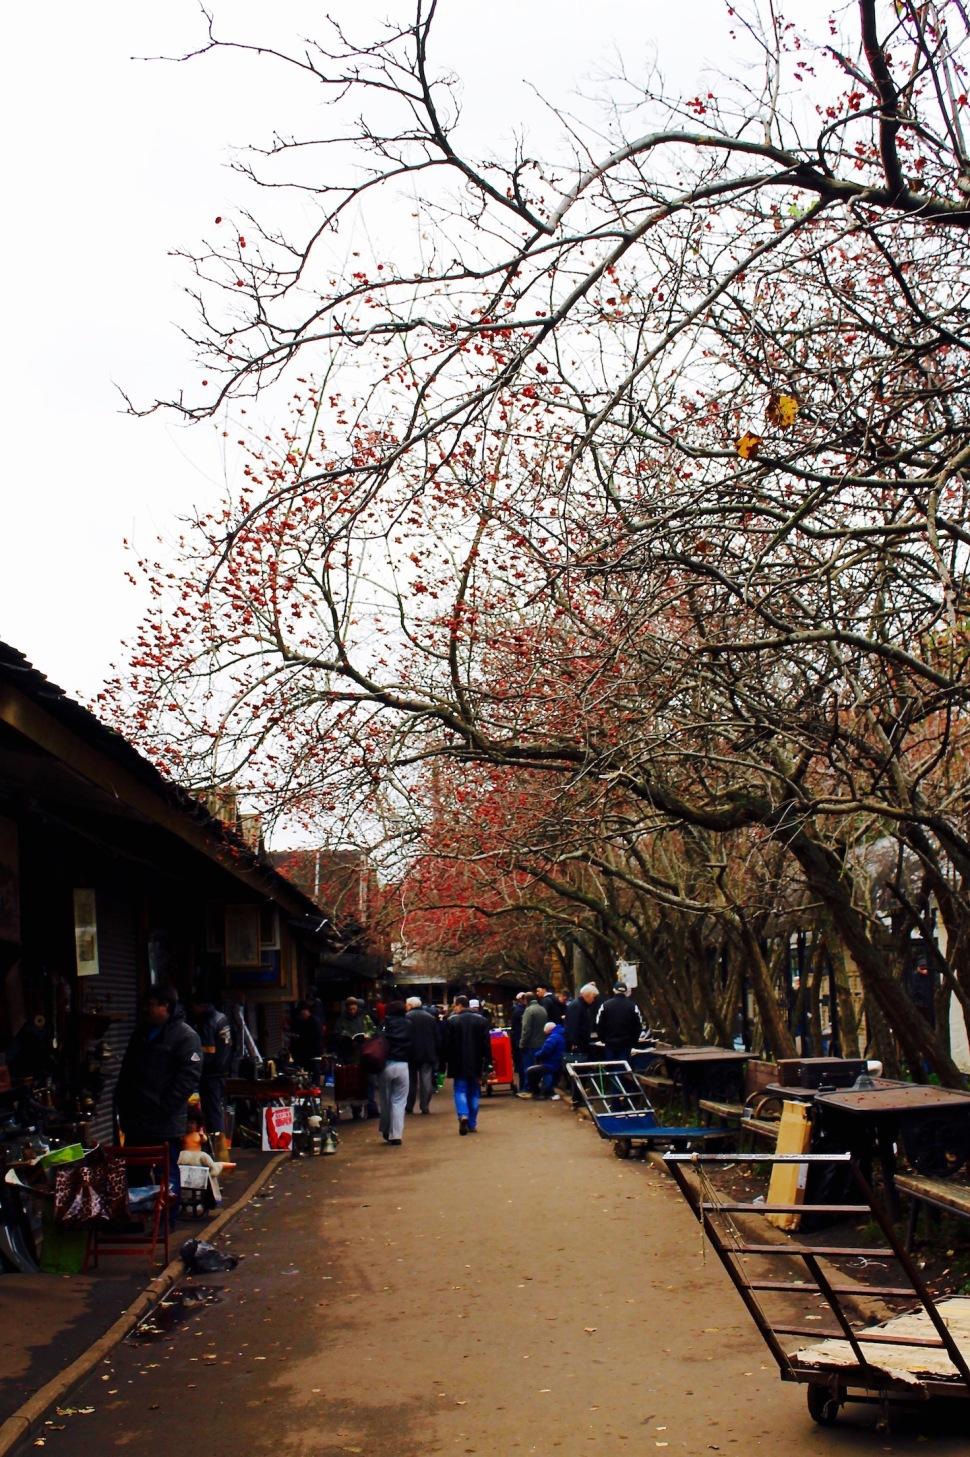 market_fleamarket_trees